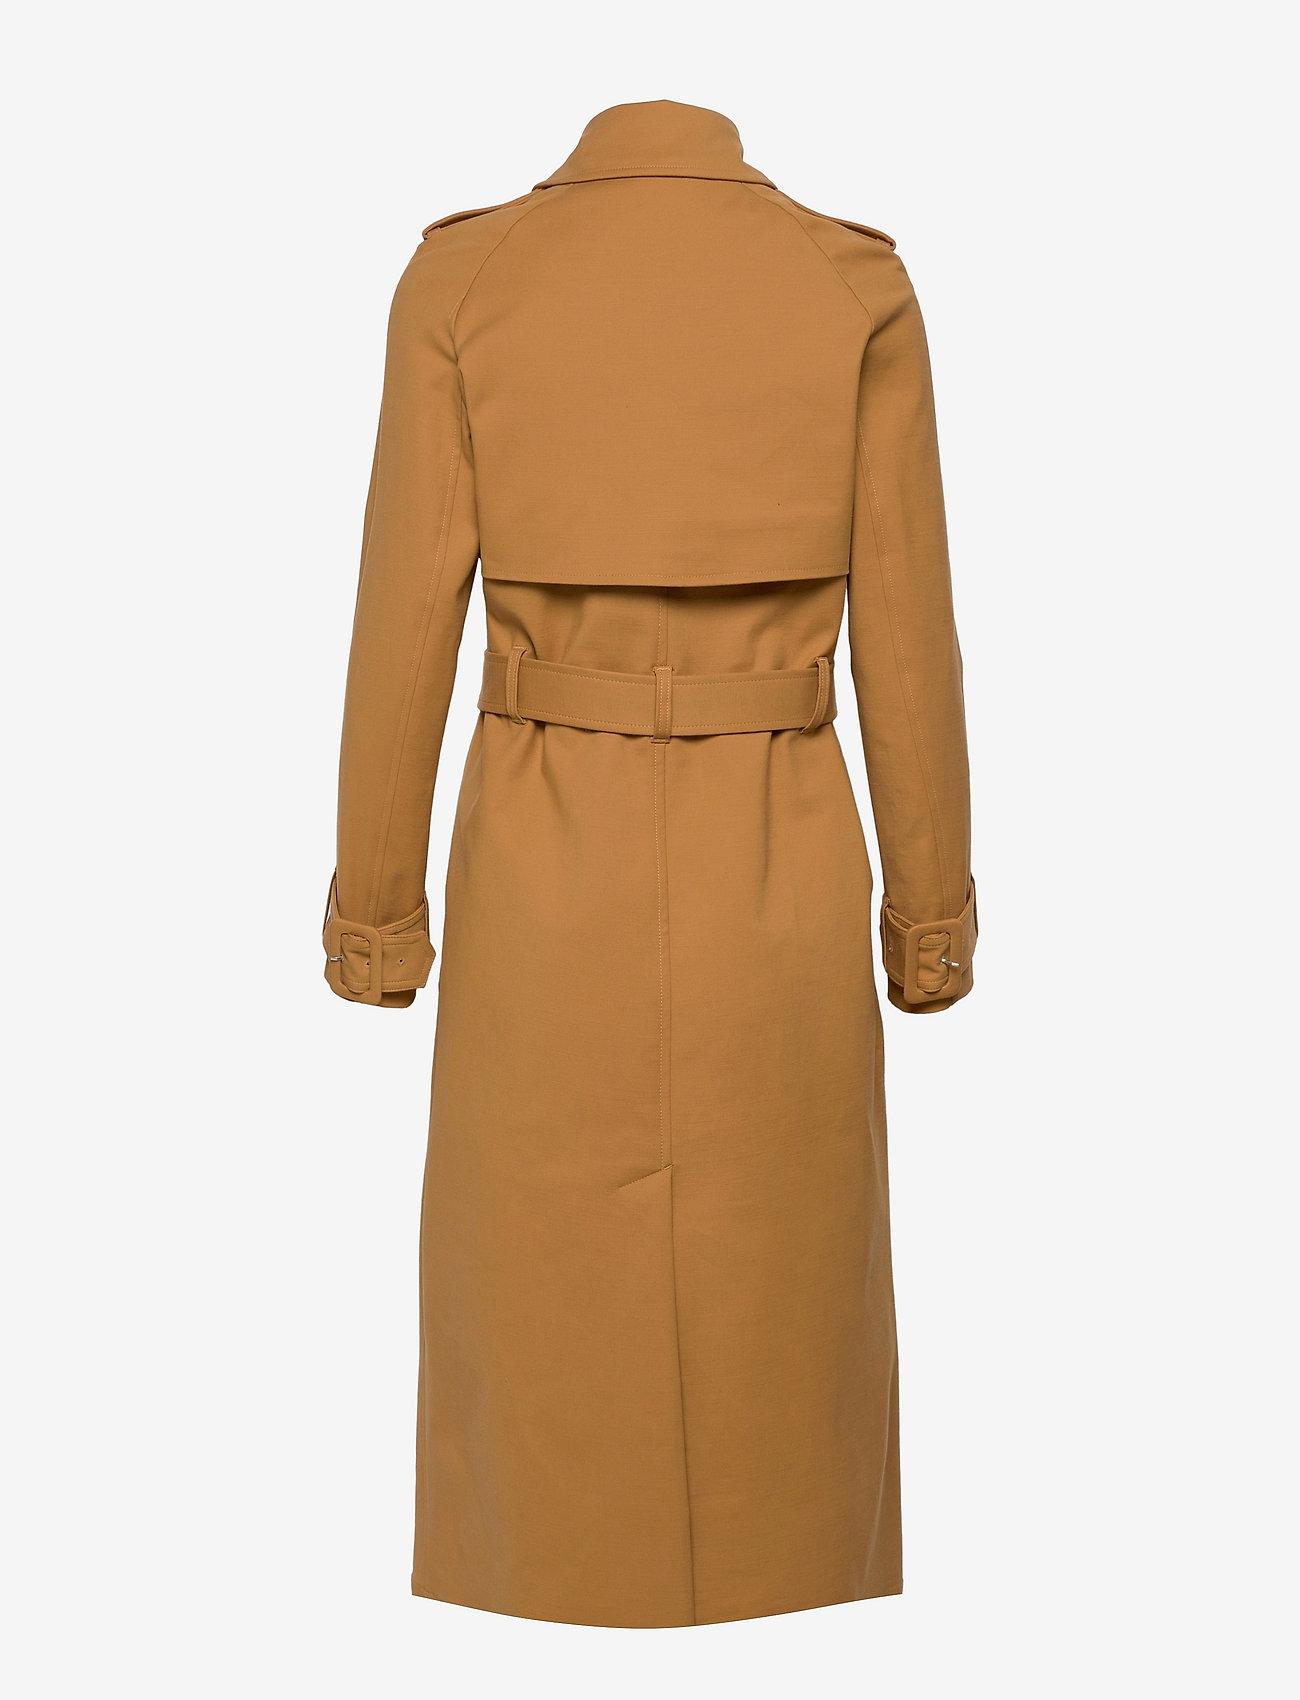 Ivy & Oak - PUKA - trench coats - morroccan sand - 1